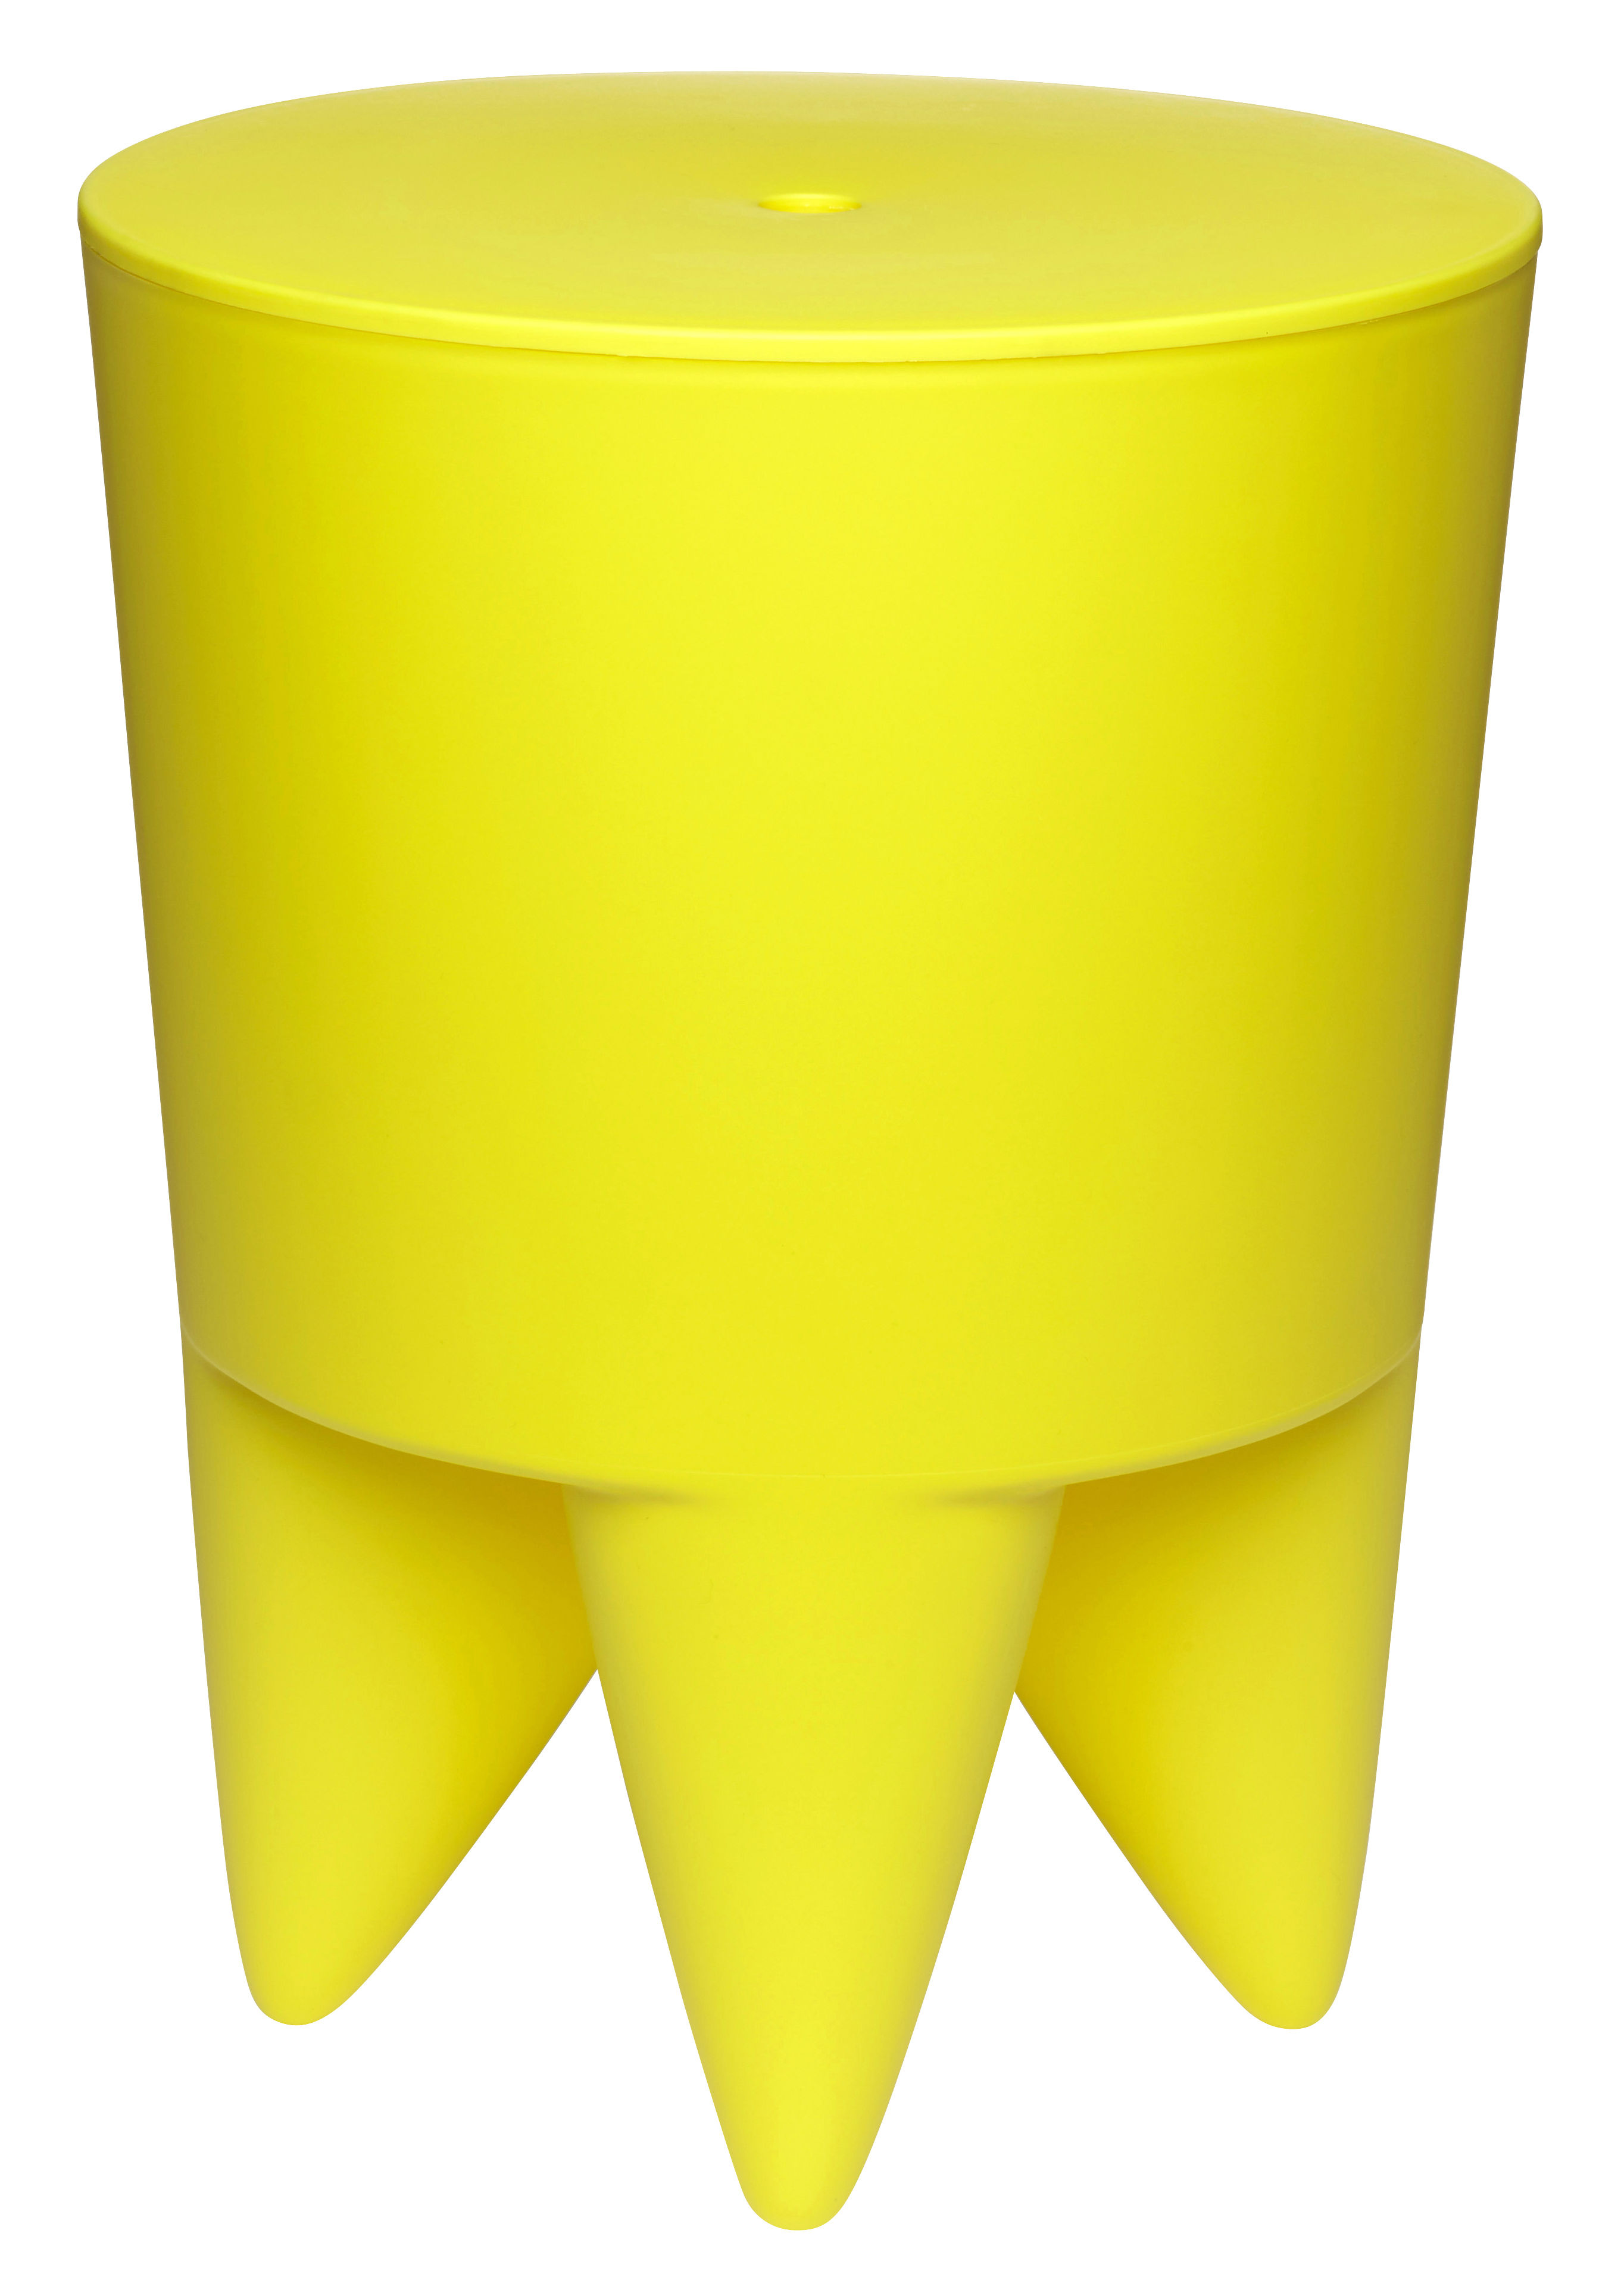 Mobilier - Tabourets bas - Tabouret New Bubu 1er Coffre - Plastique - XO - Jaune vif - Polypropylène